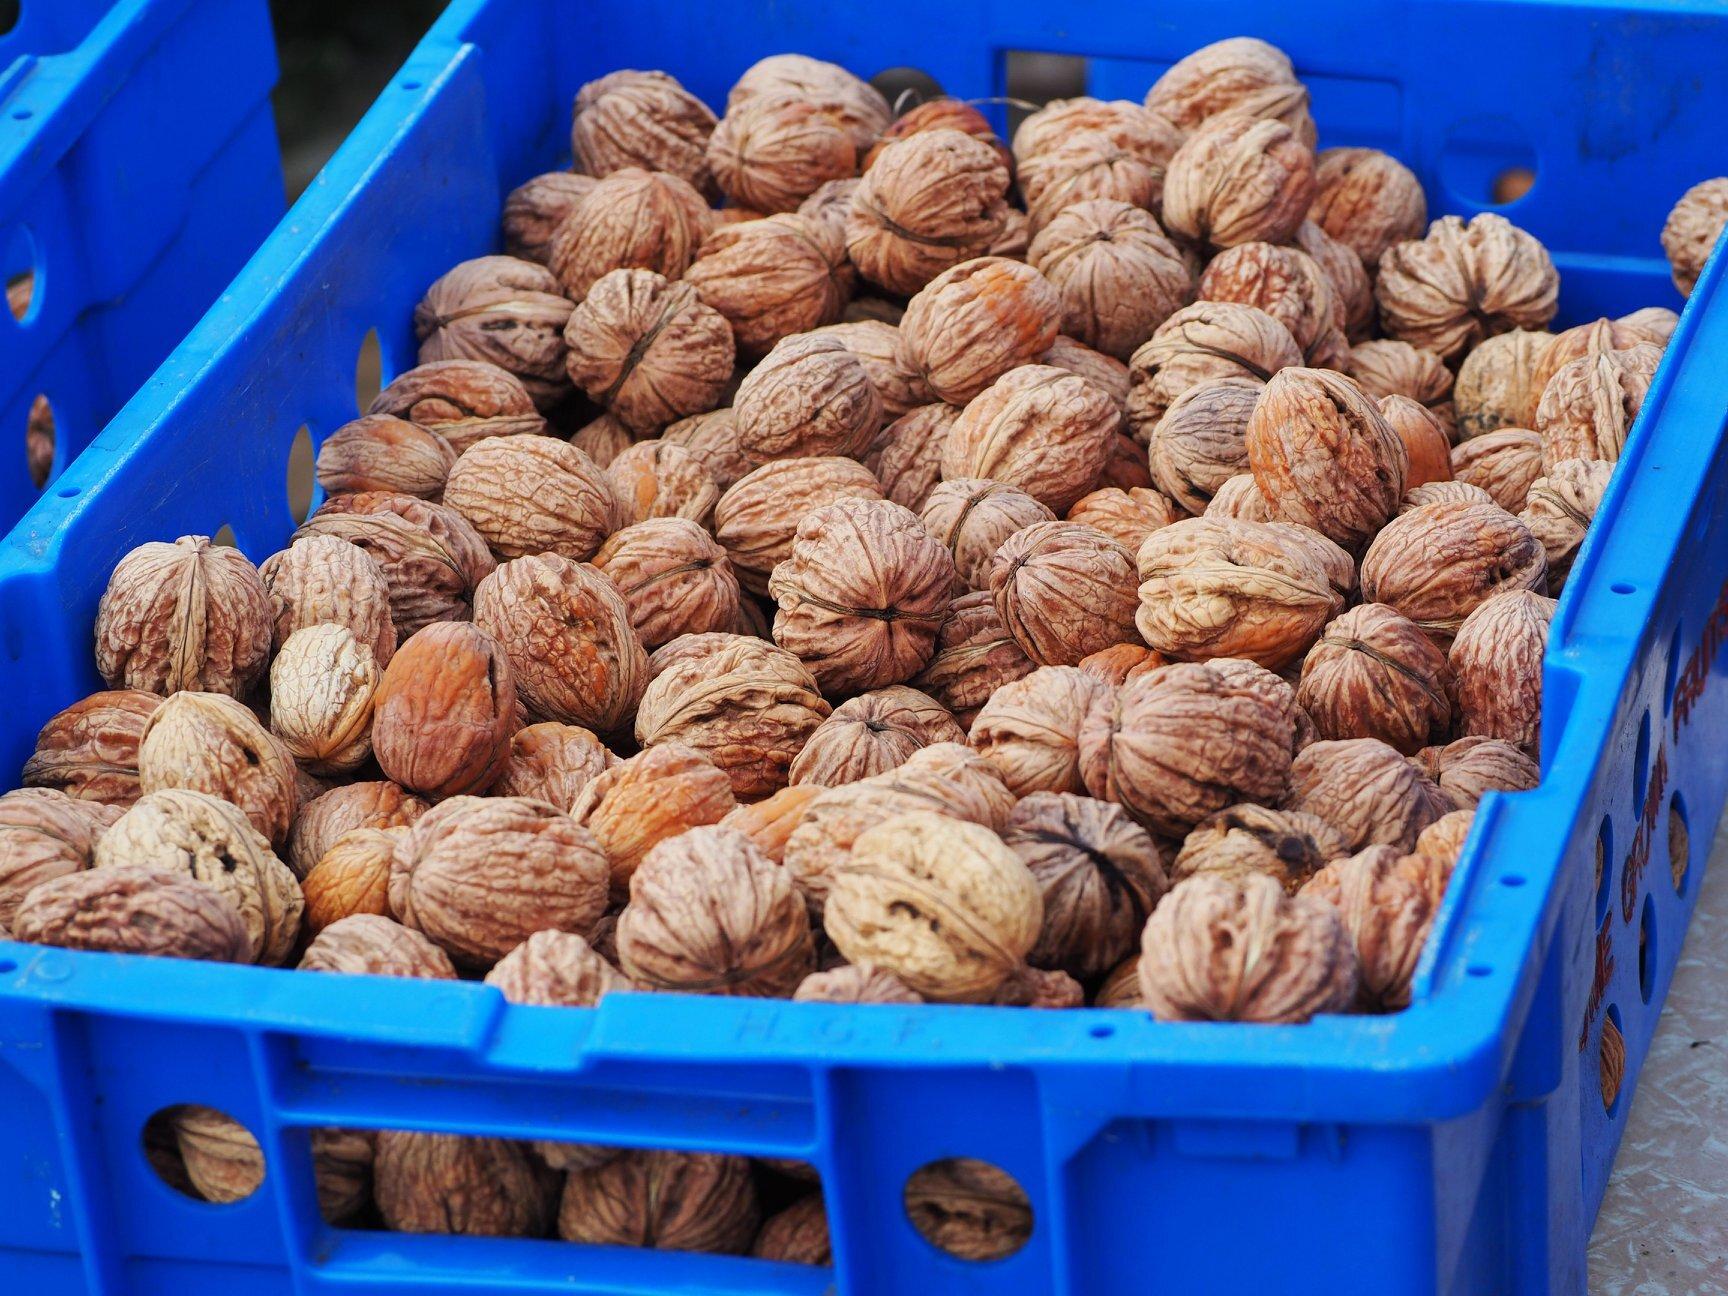 Wet-Walnuts-Boxted-Essex